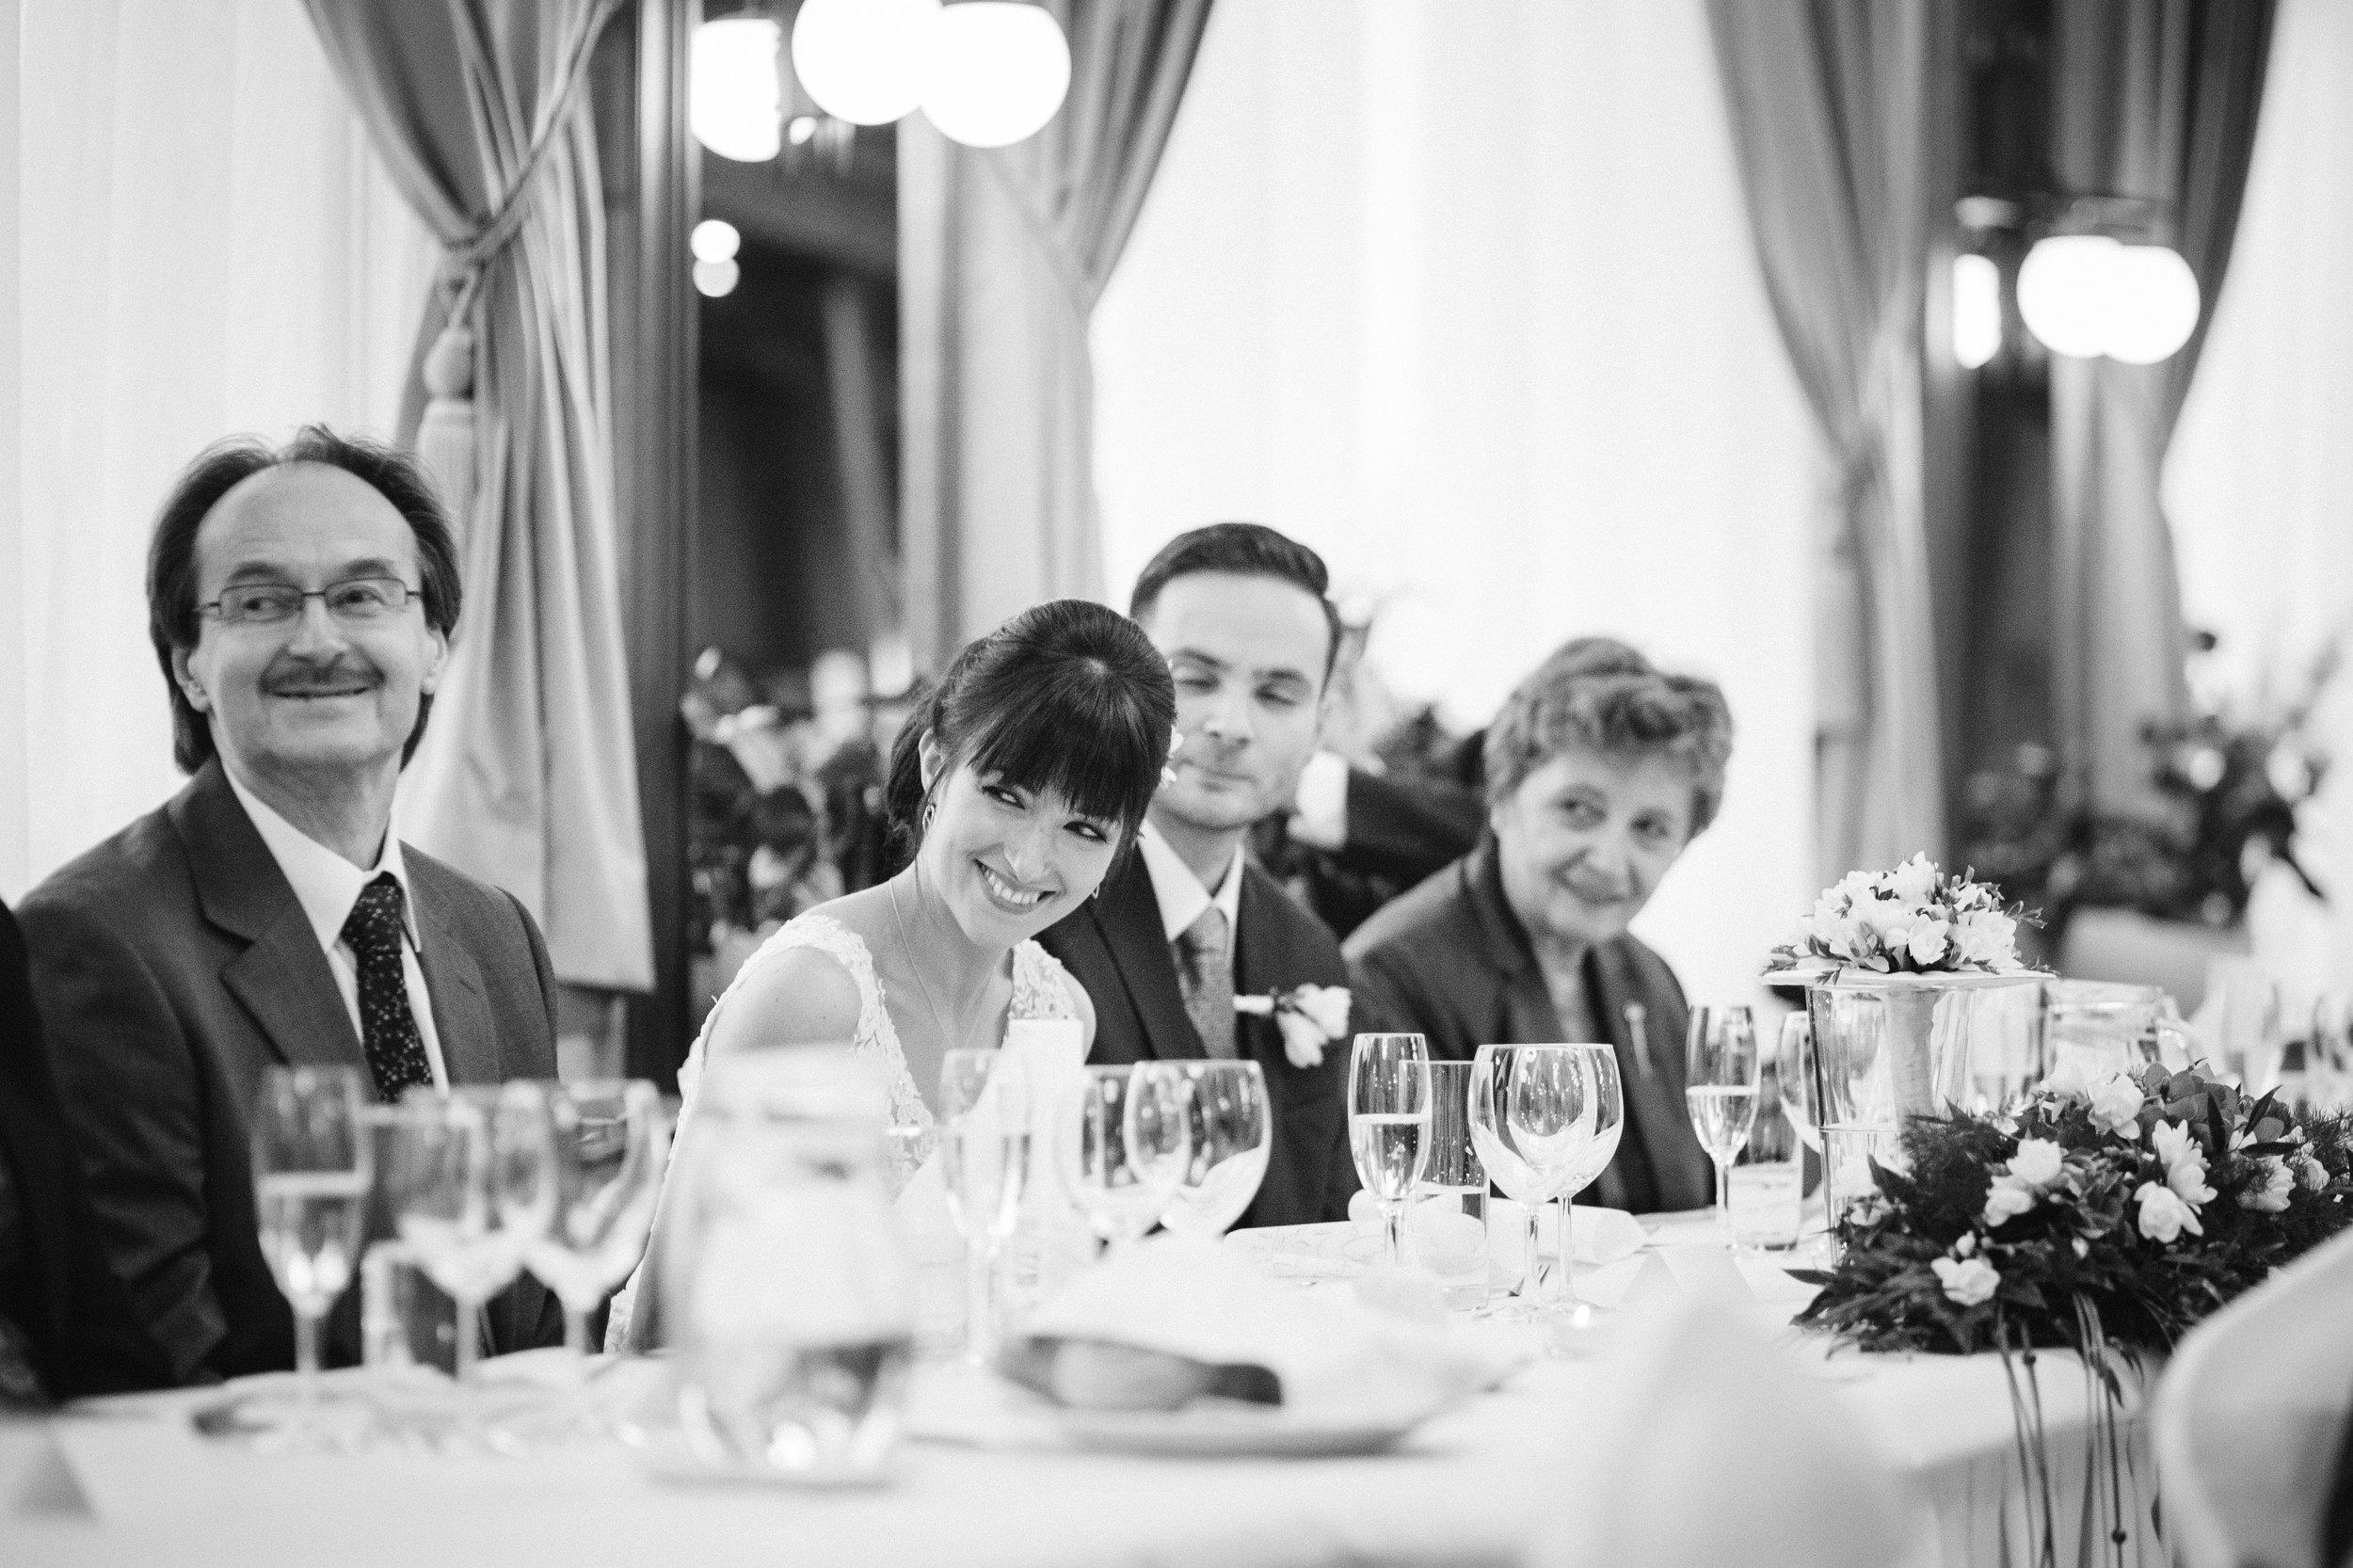 destination-wedding-photographer-slovakia-bratislava-bw-bride-documentary-style-1.jpg